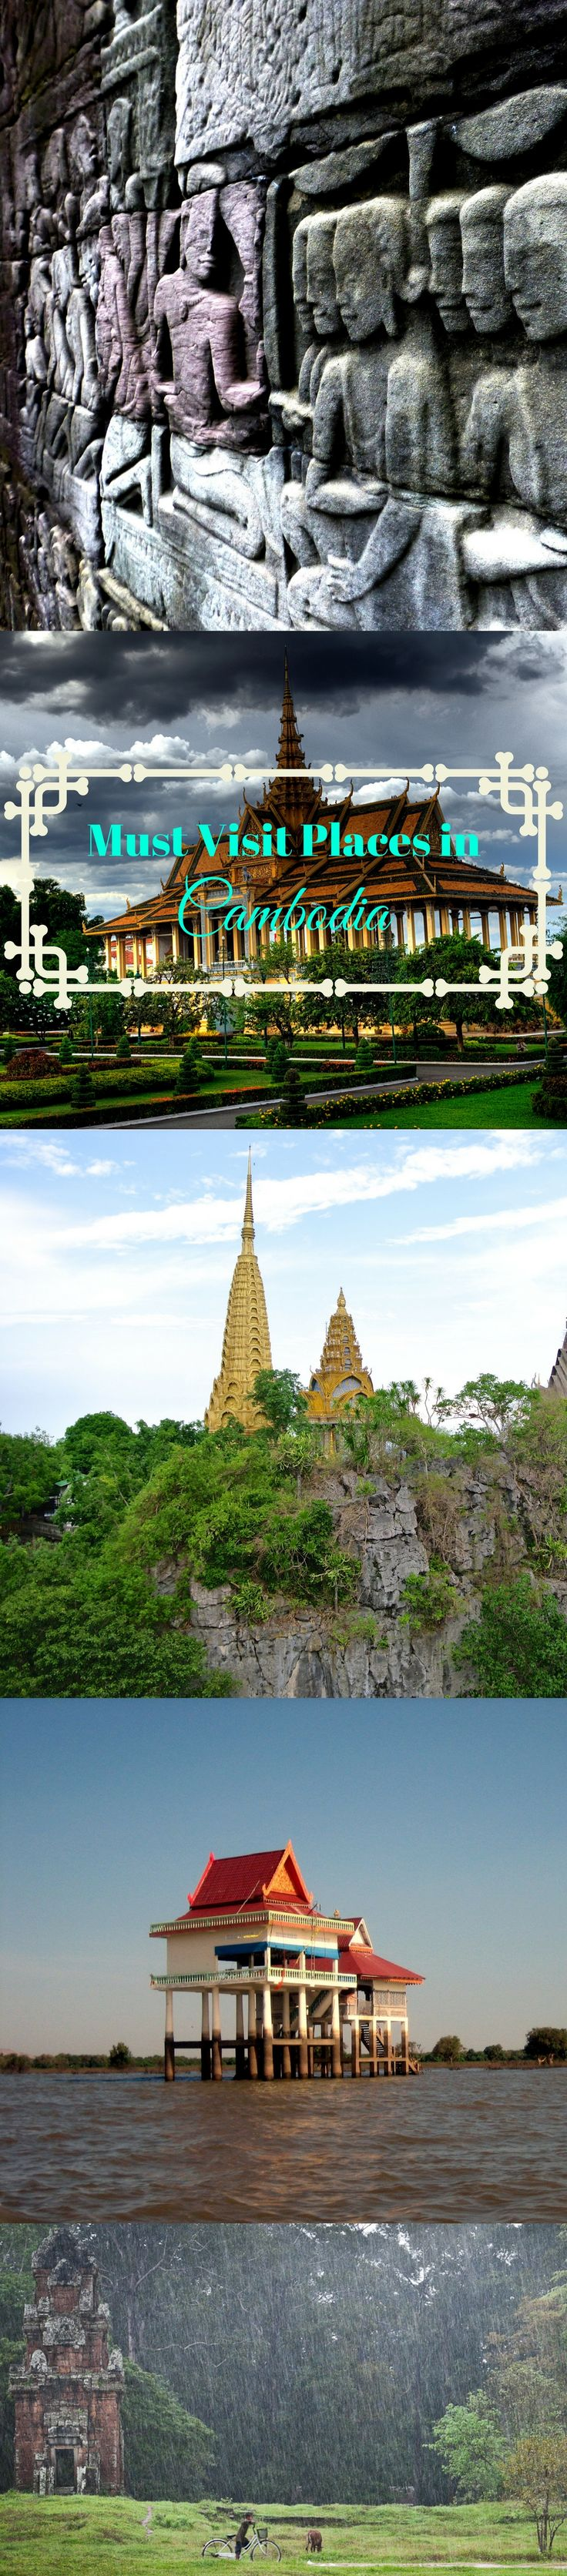 12 Places You Need to See on Your Cambodia Holiday. #GoTripovo #Tripovo #travel #Cambodia #Asia #travelguide #tour #trip #nature #mustvisit #places #PhnomPhen #SiemReap #Battambang #BanteayChhmar #TonleSap #KompongCham #Kratie #KohKong #Sihanoukville #KohRong #Kampot #Kep